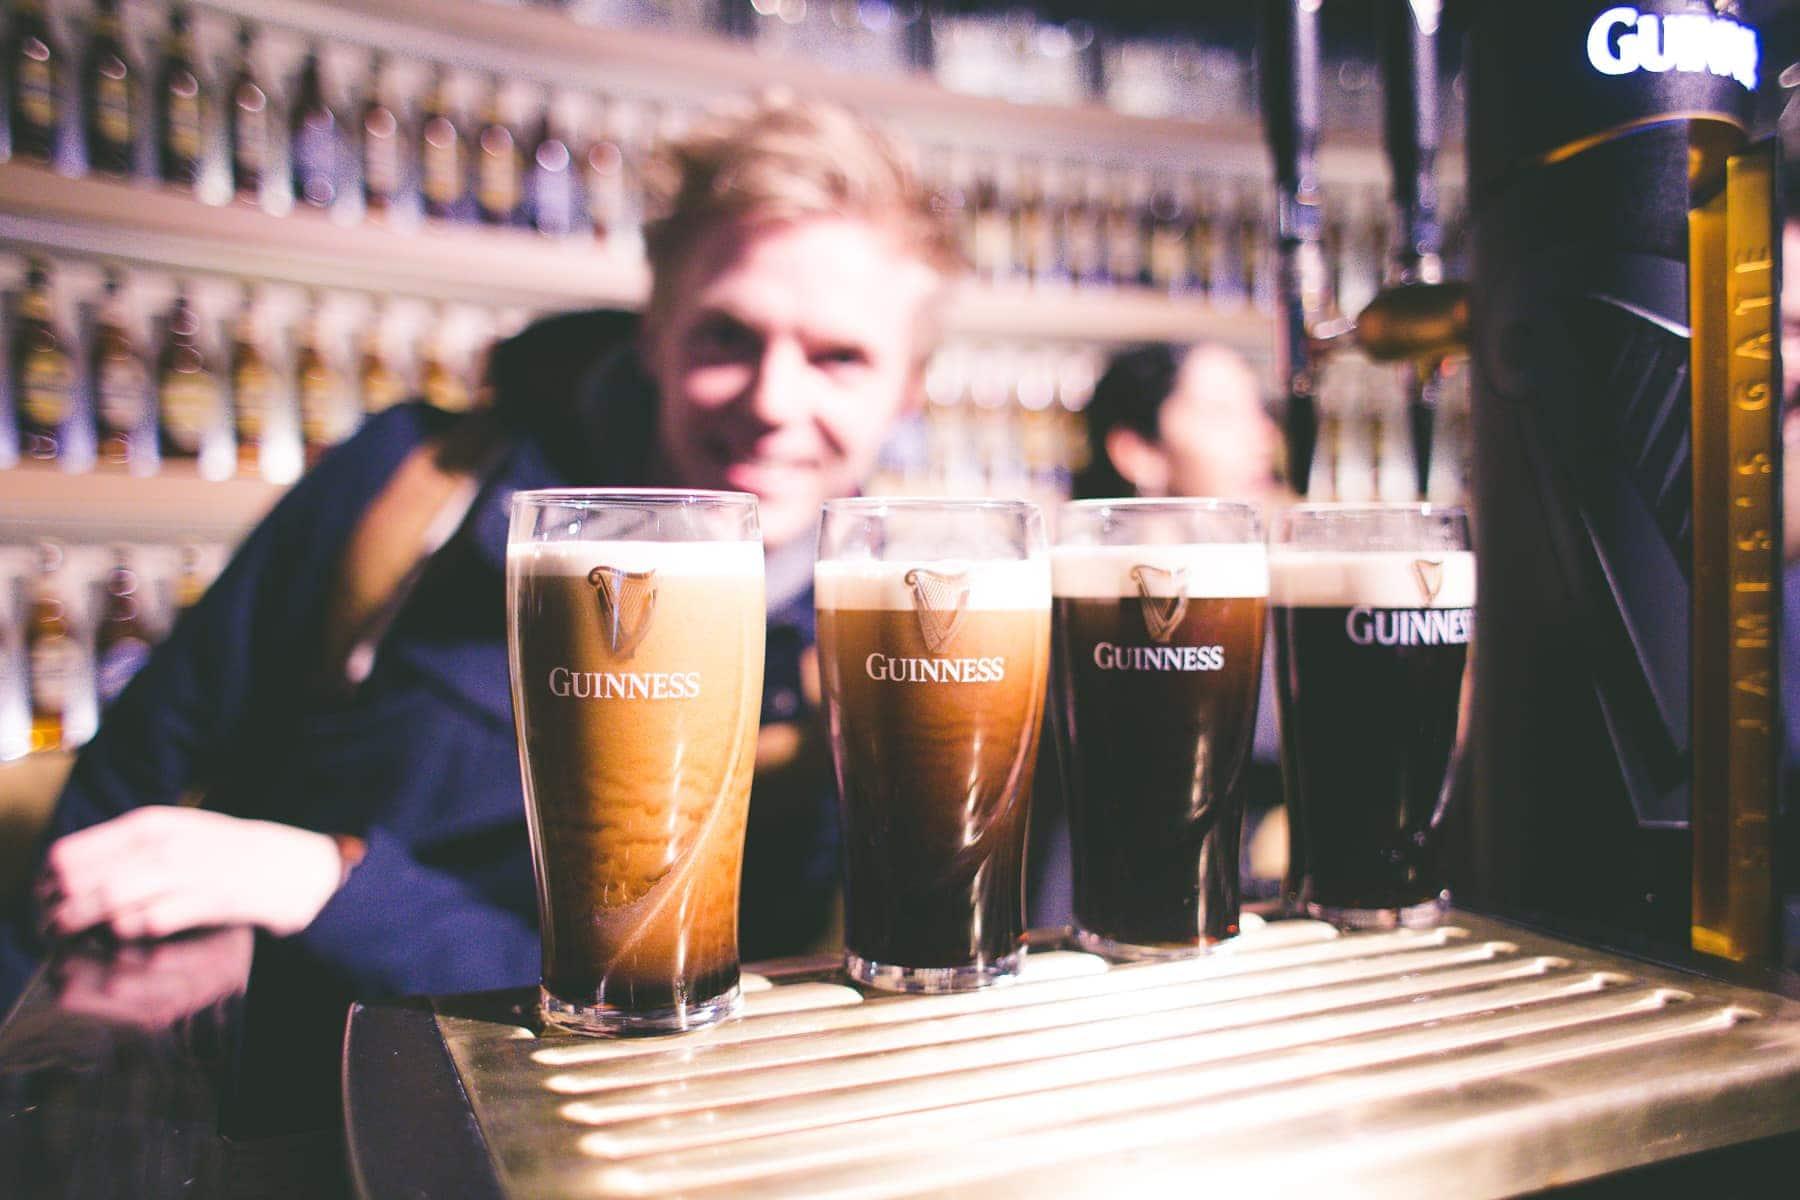 Na závěr si načepujete pivo a dostanete certifikát